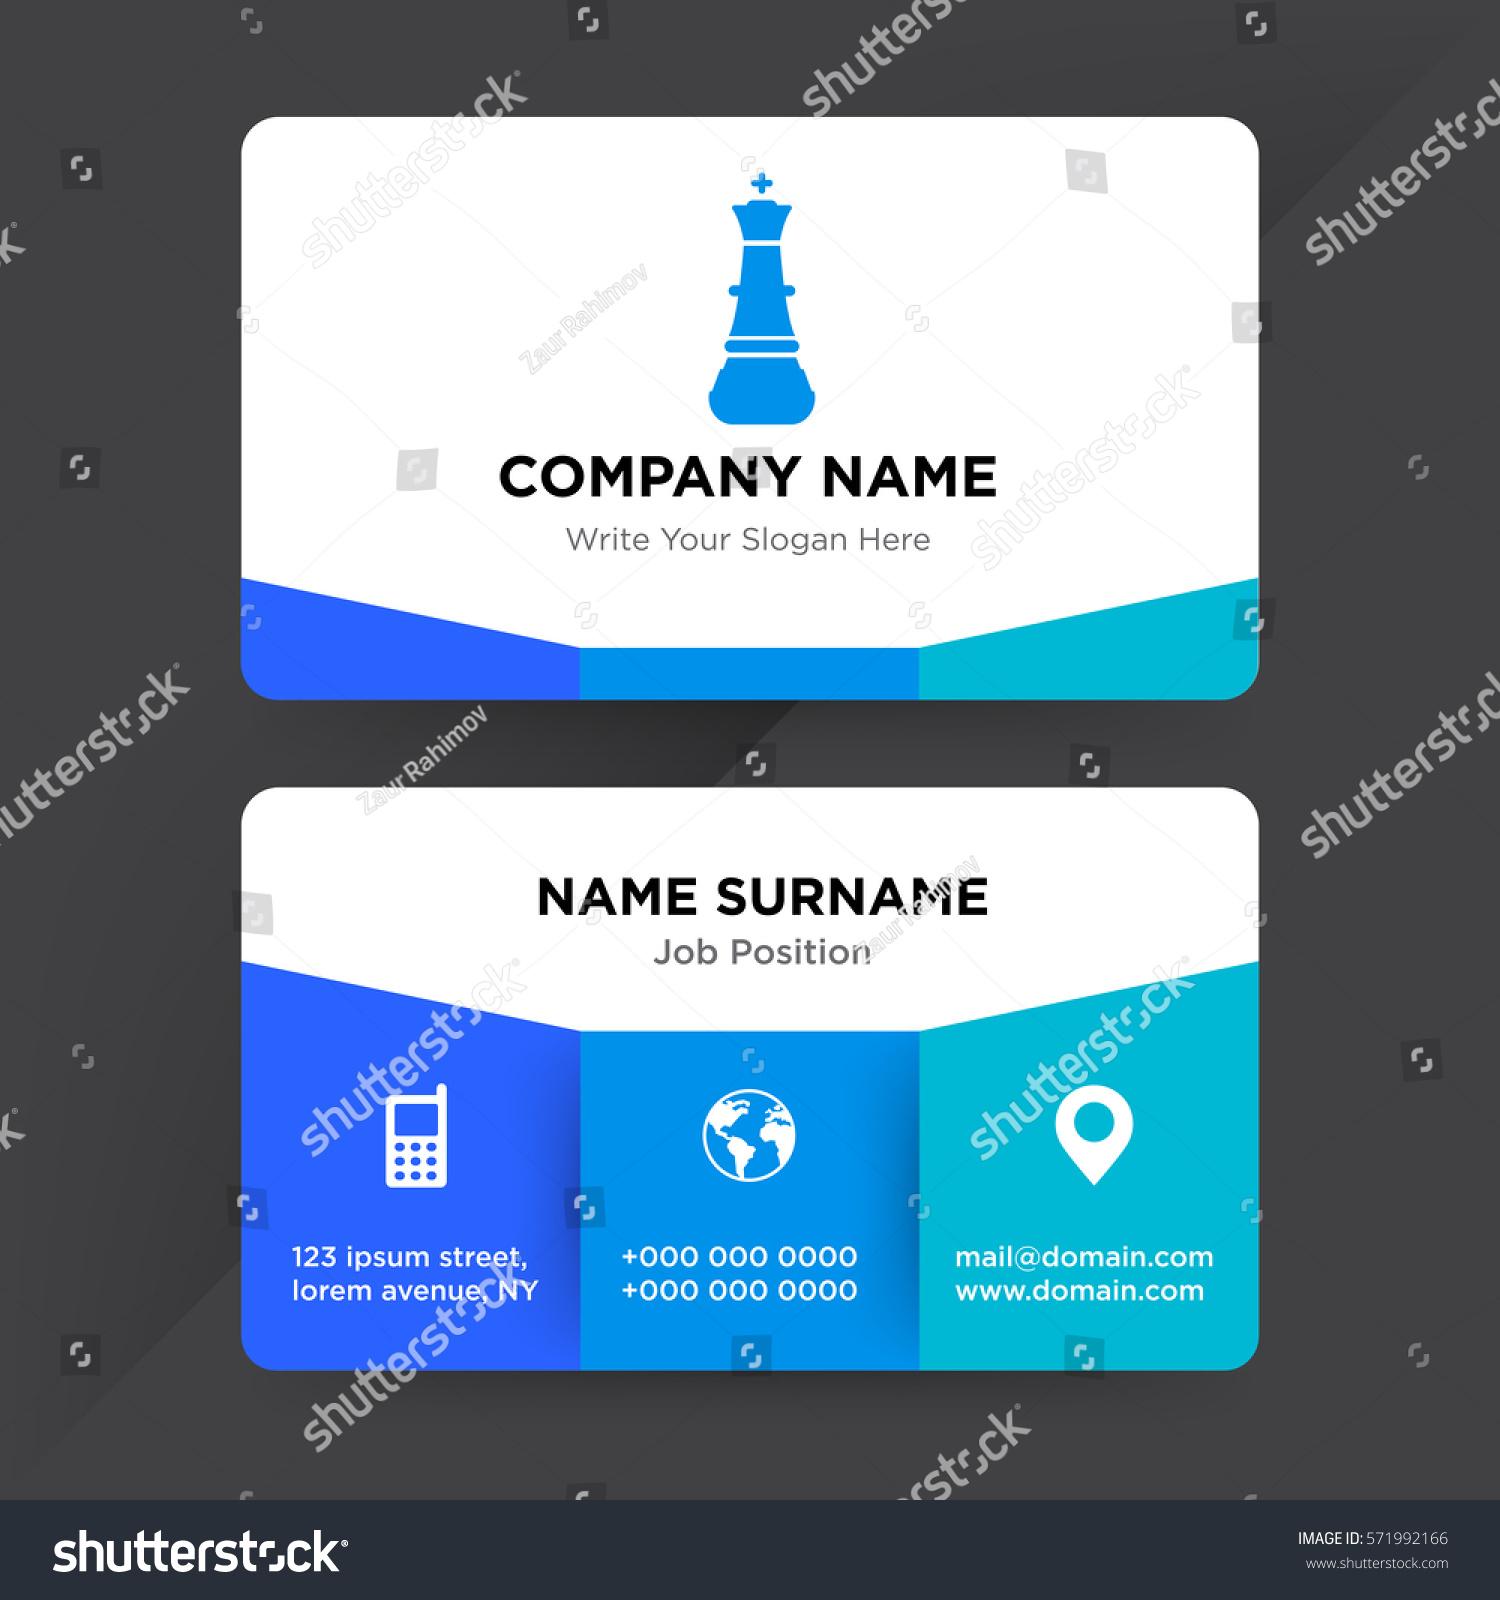 Template Business Card Management Chess School Stock Vector HD ...